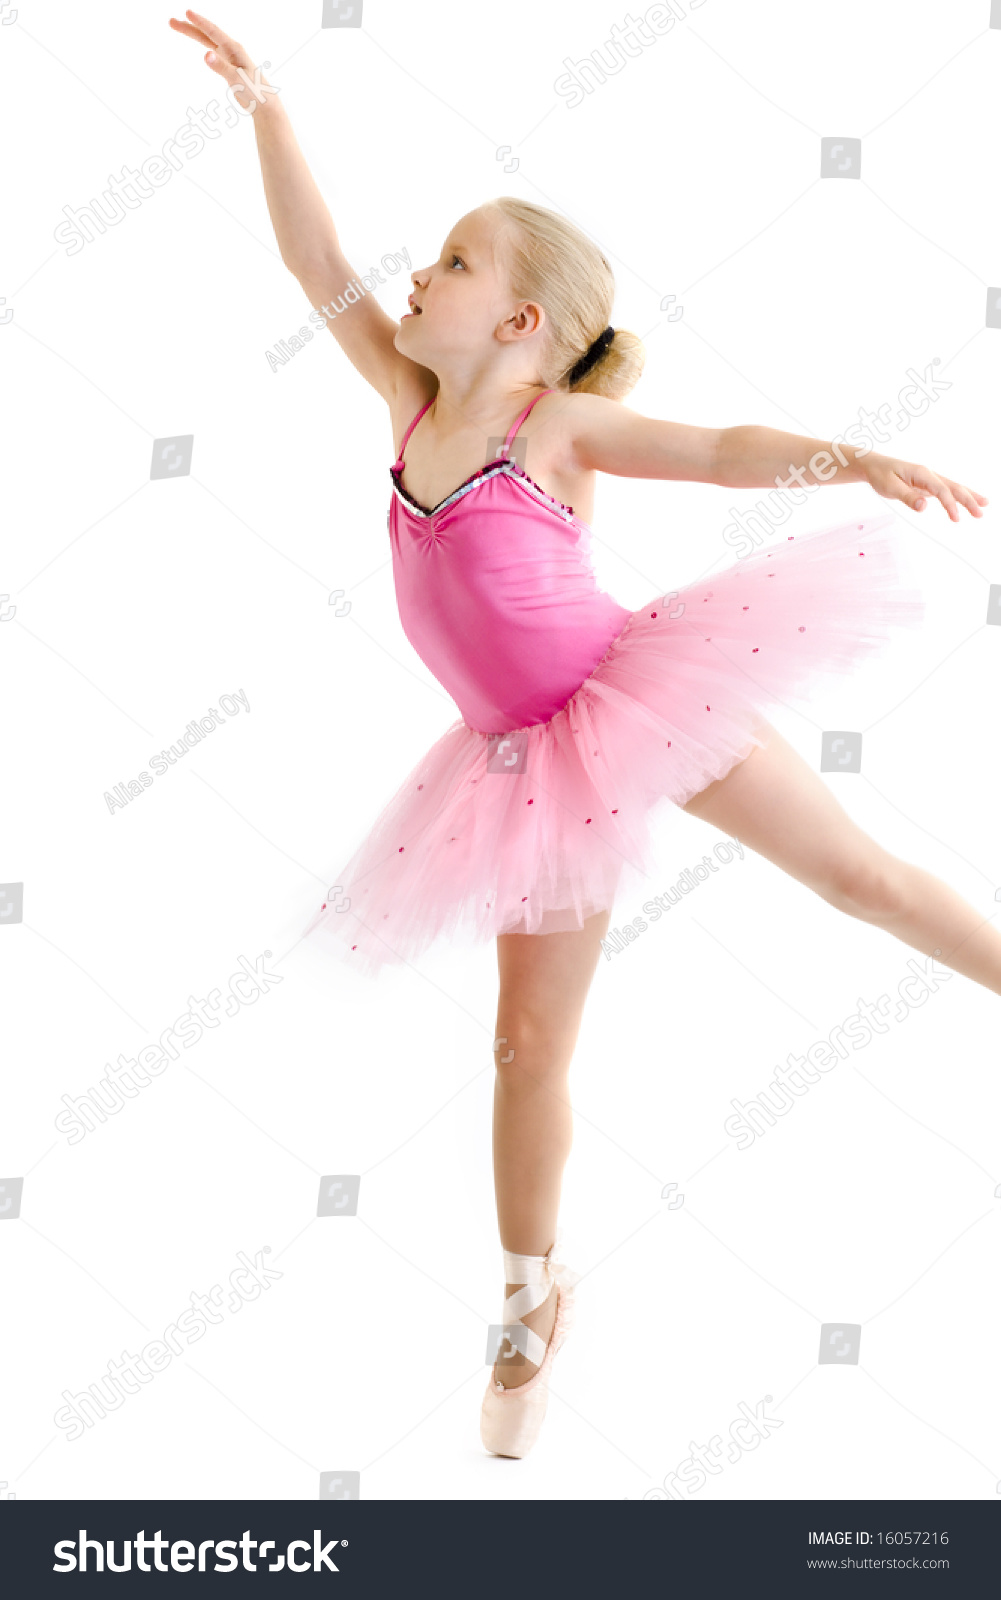 ballerina young images - usseek.com